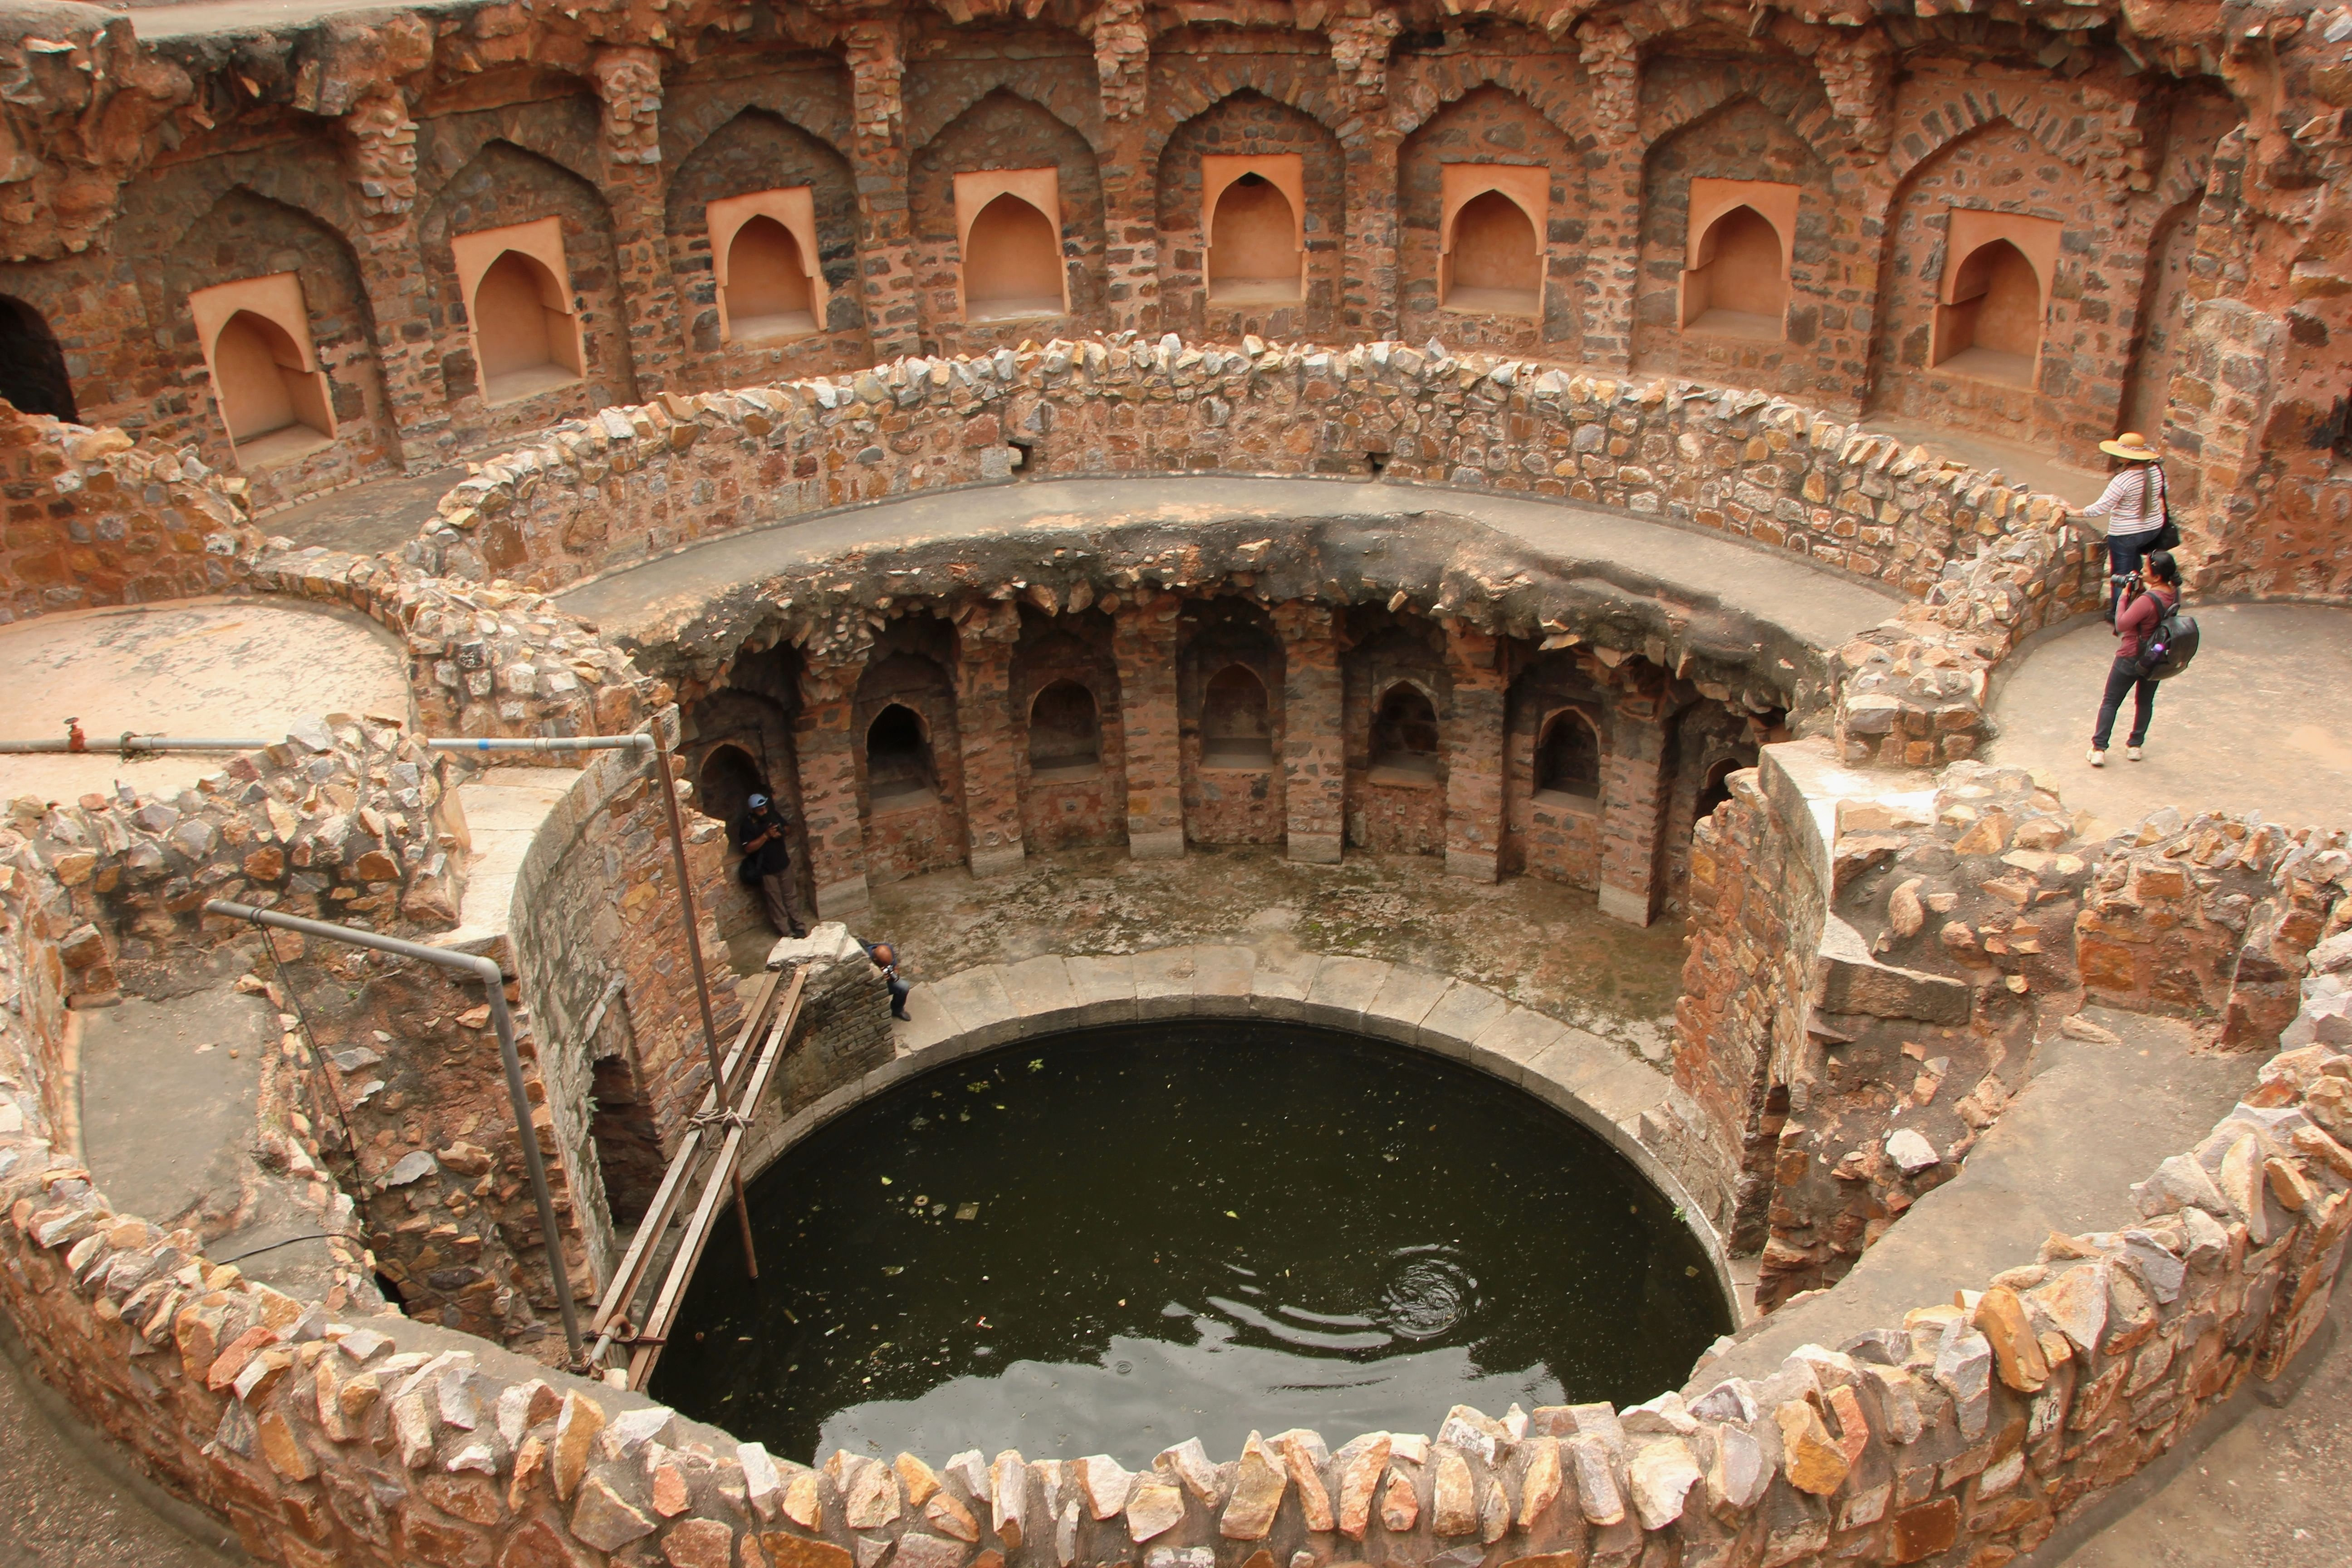 A_Baoli_in_Ferozshah_Kotla,_New_Delhi